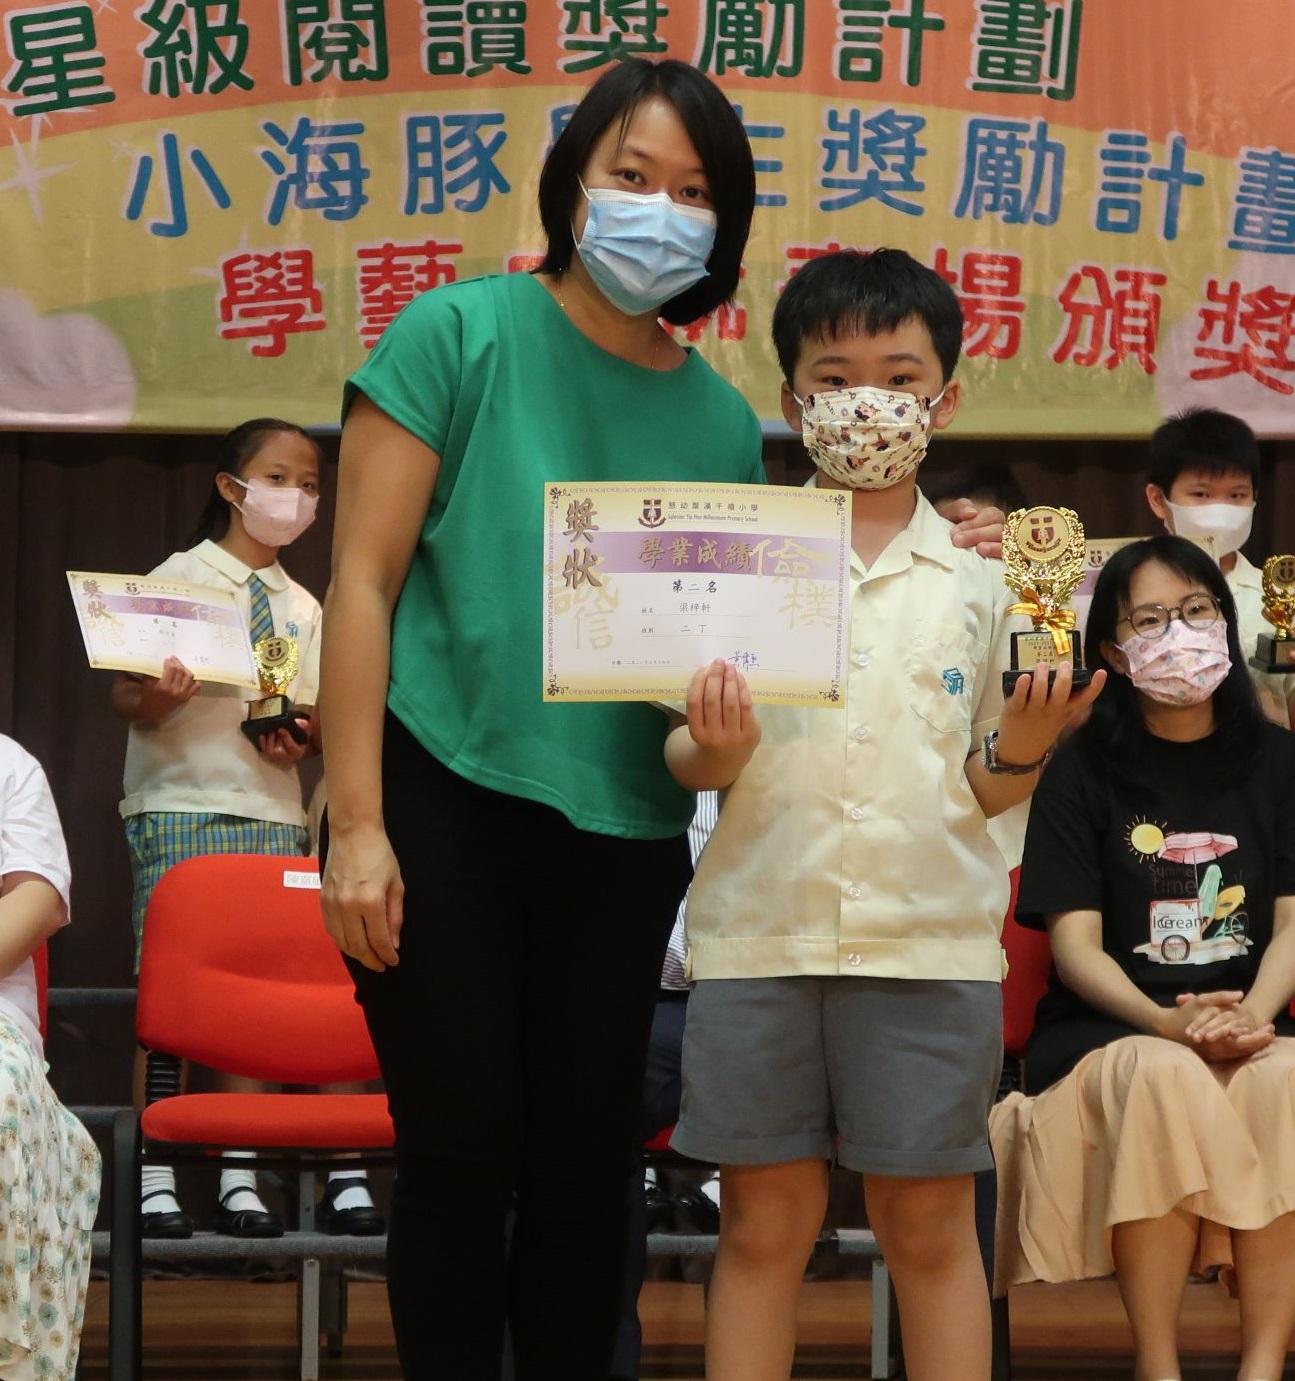 https://syh.edu.hk/sites/default/files/img_5416.jpg